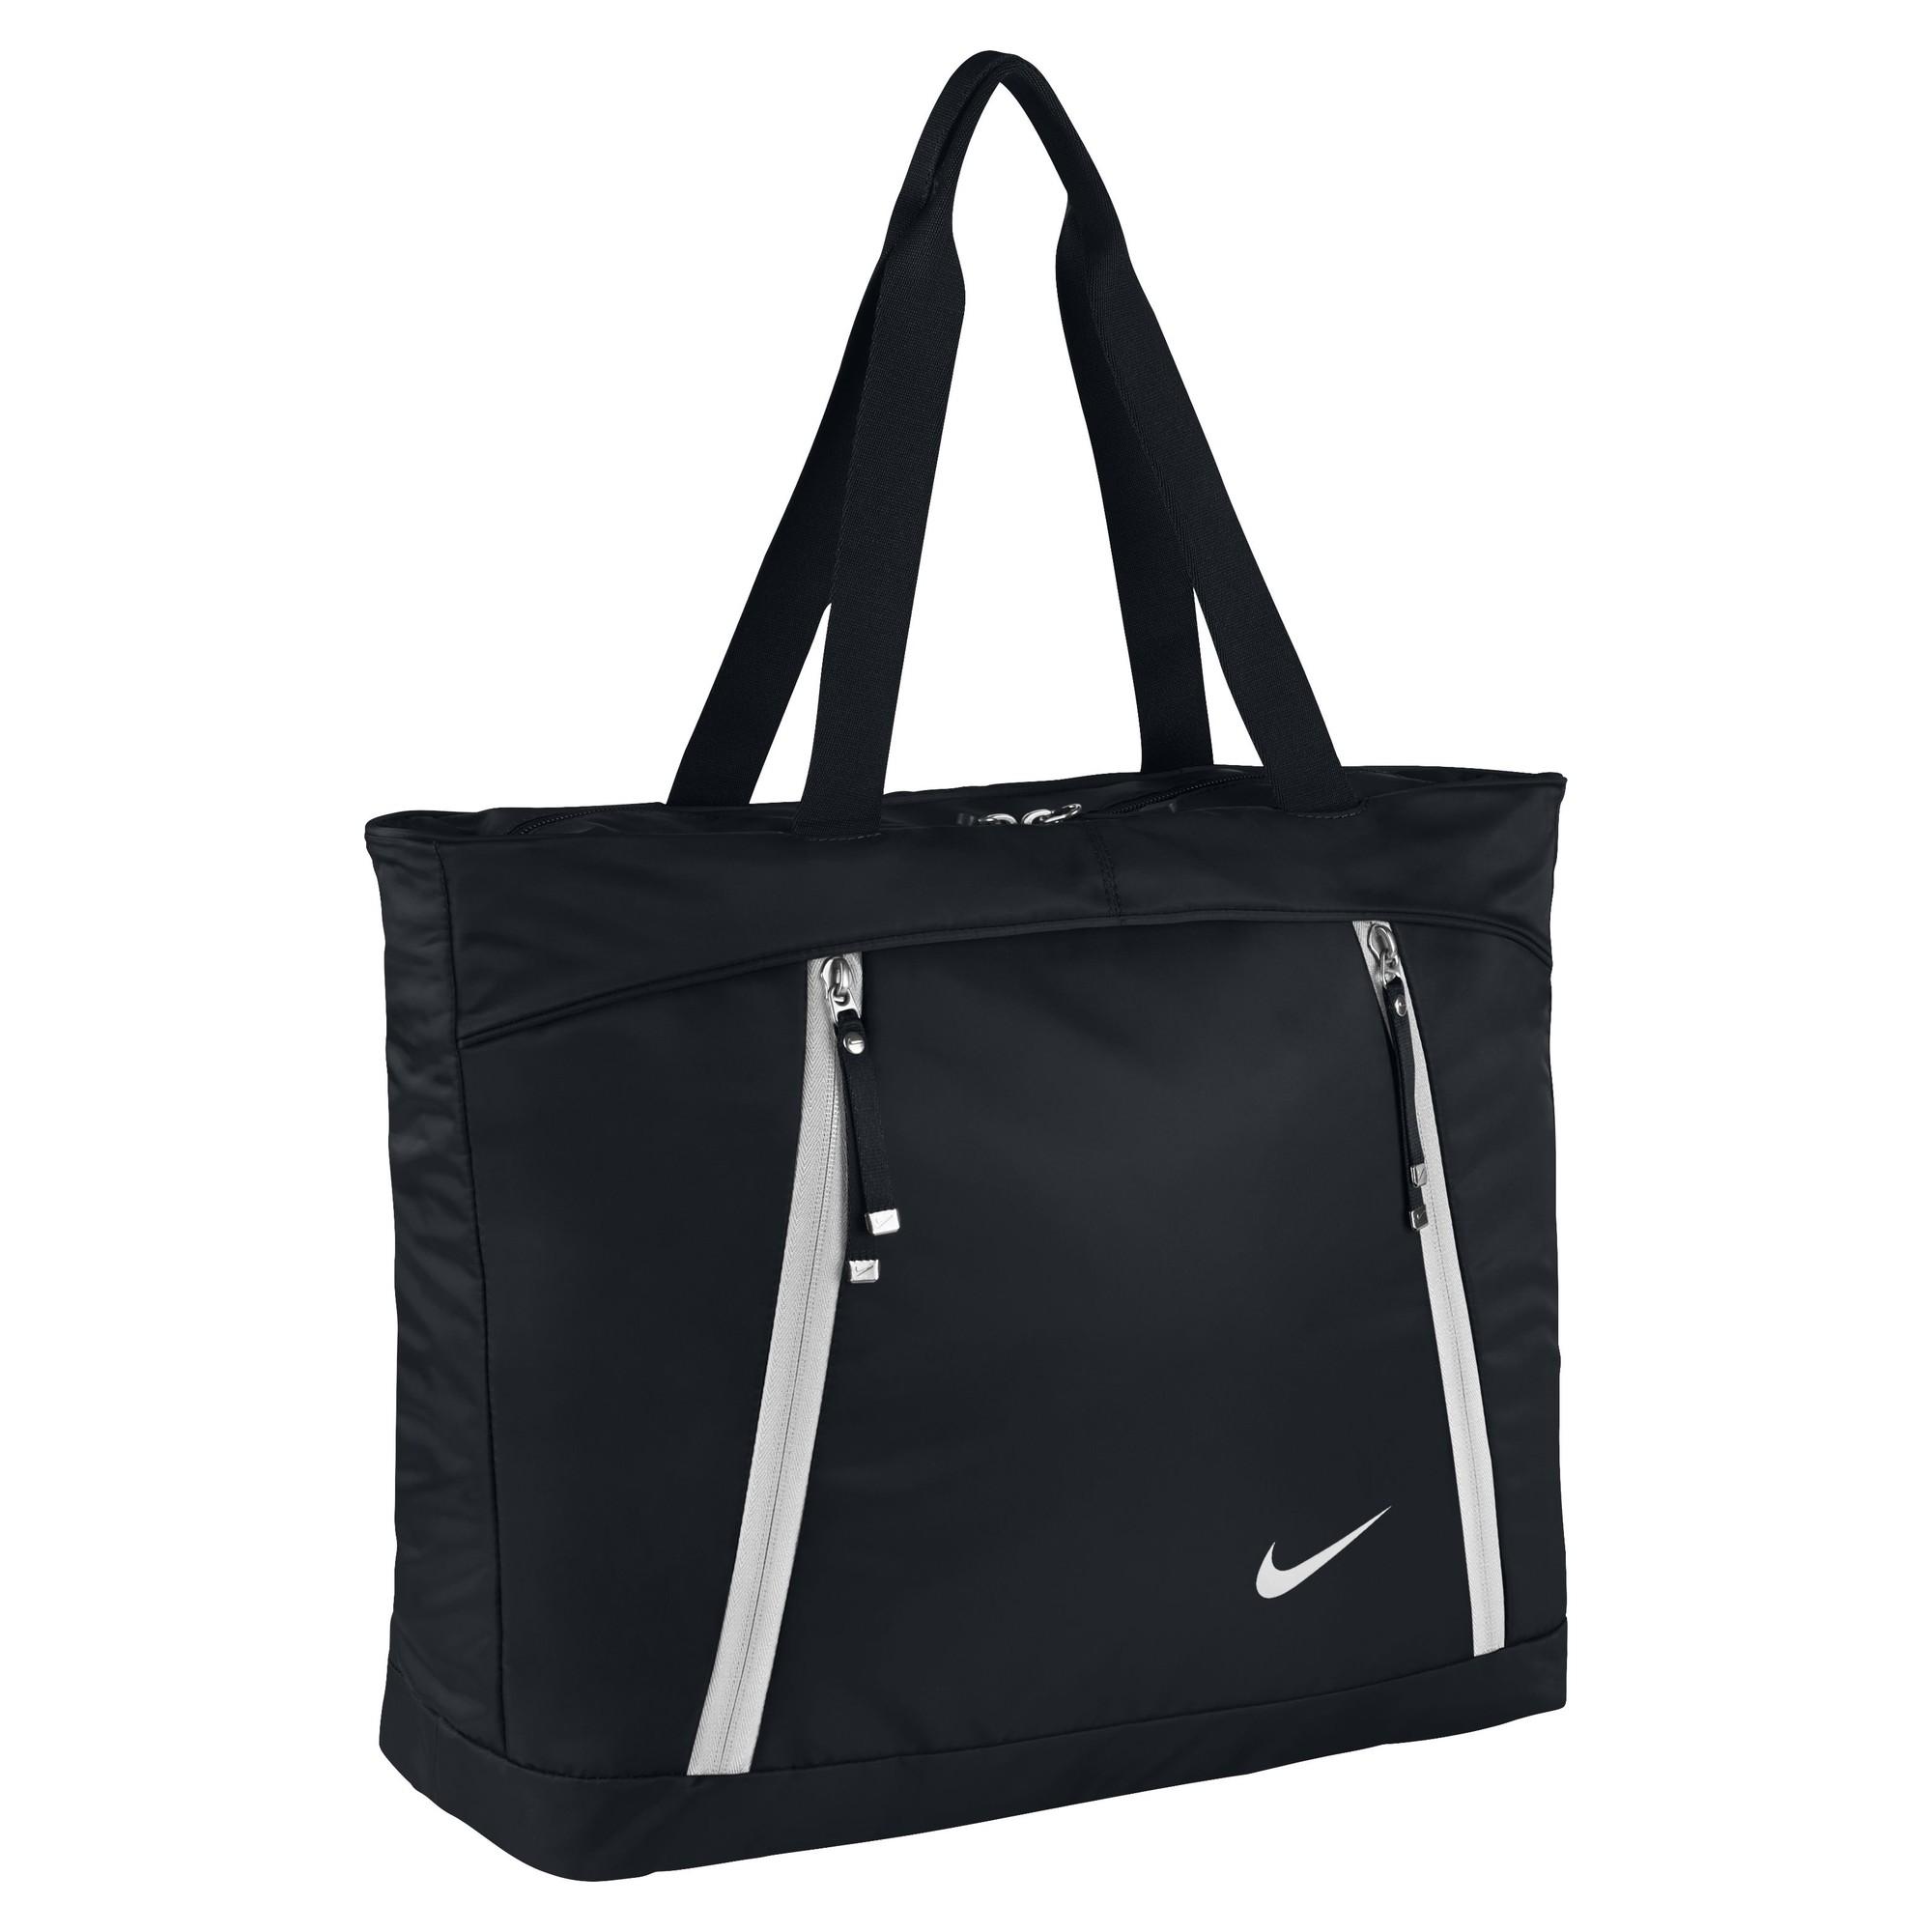 421cdac4ee Nike Taška Aura Print Club Training Tote BA5204010 - Glami.cz